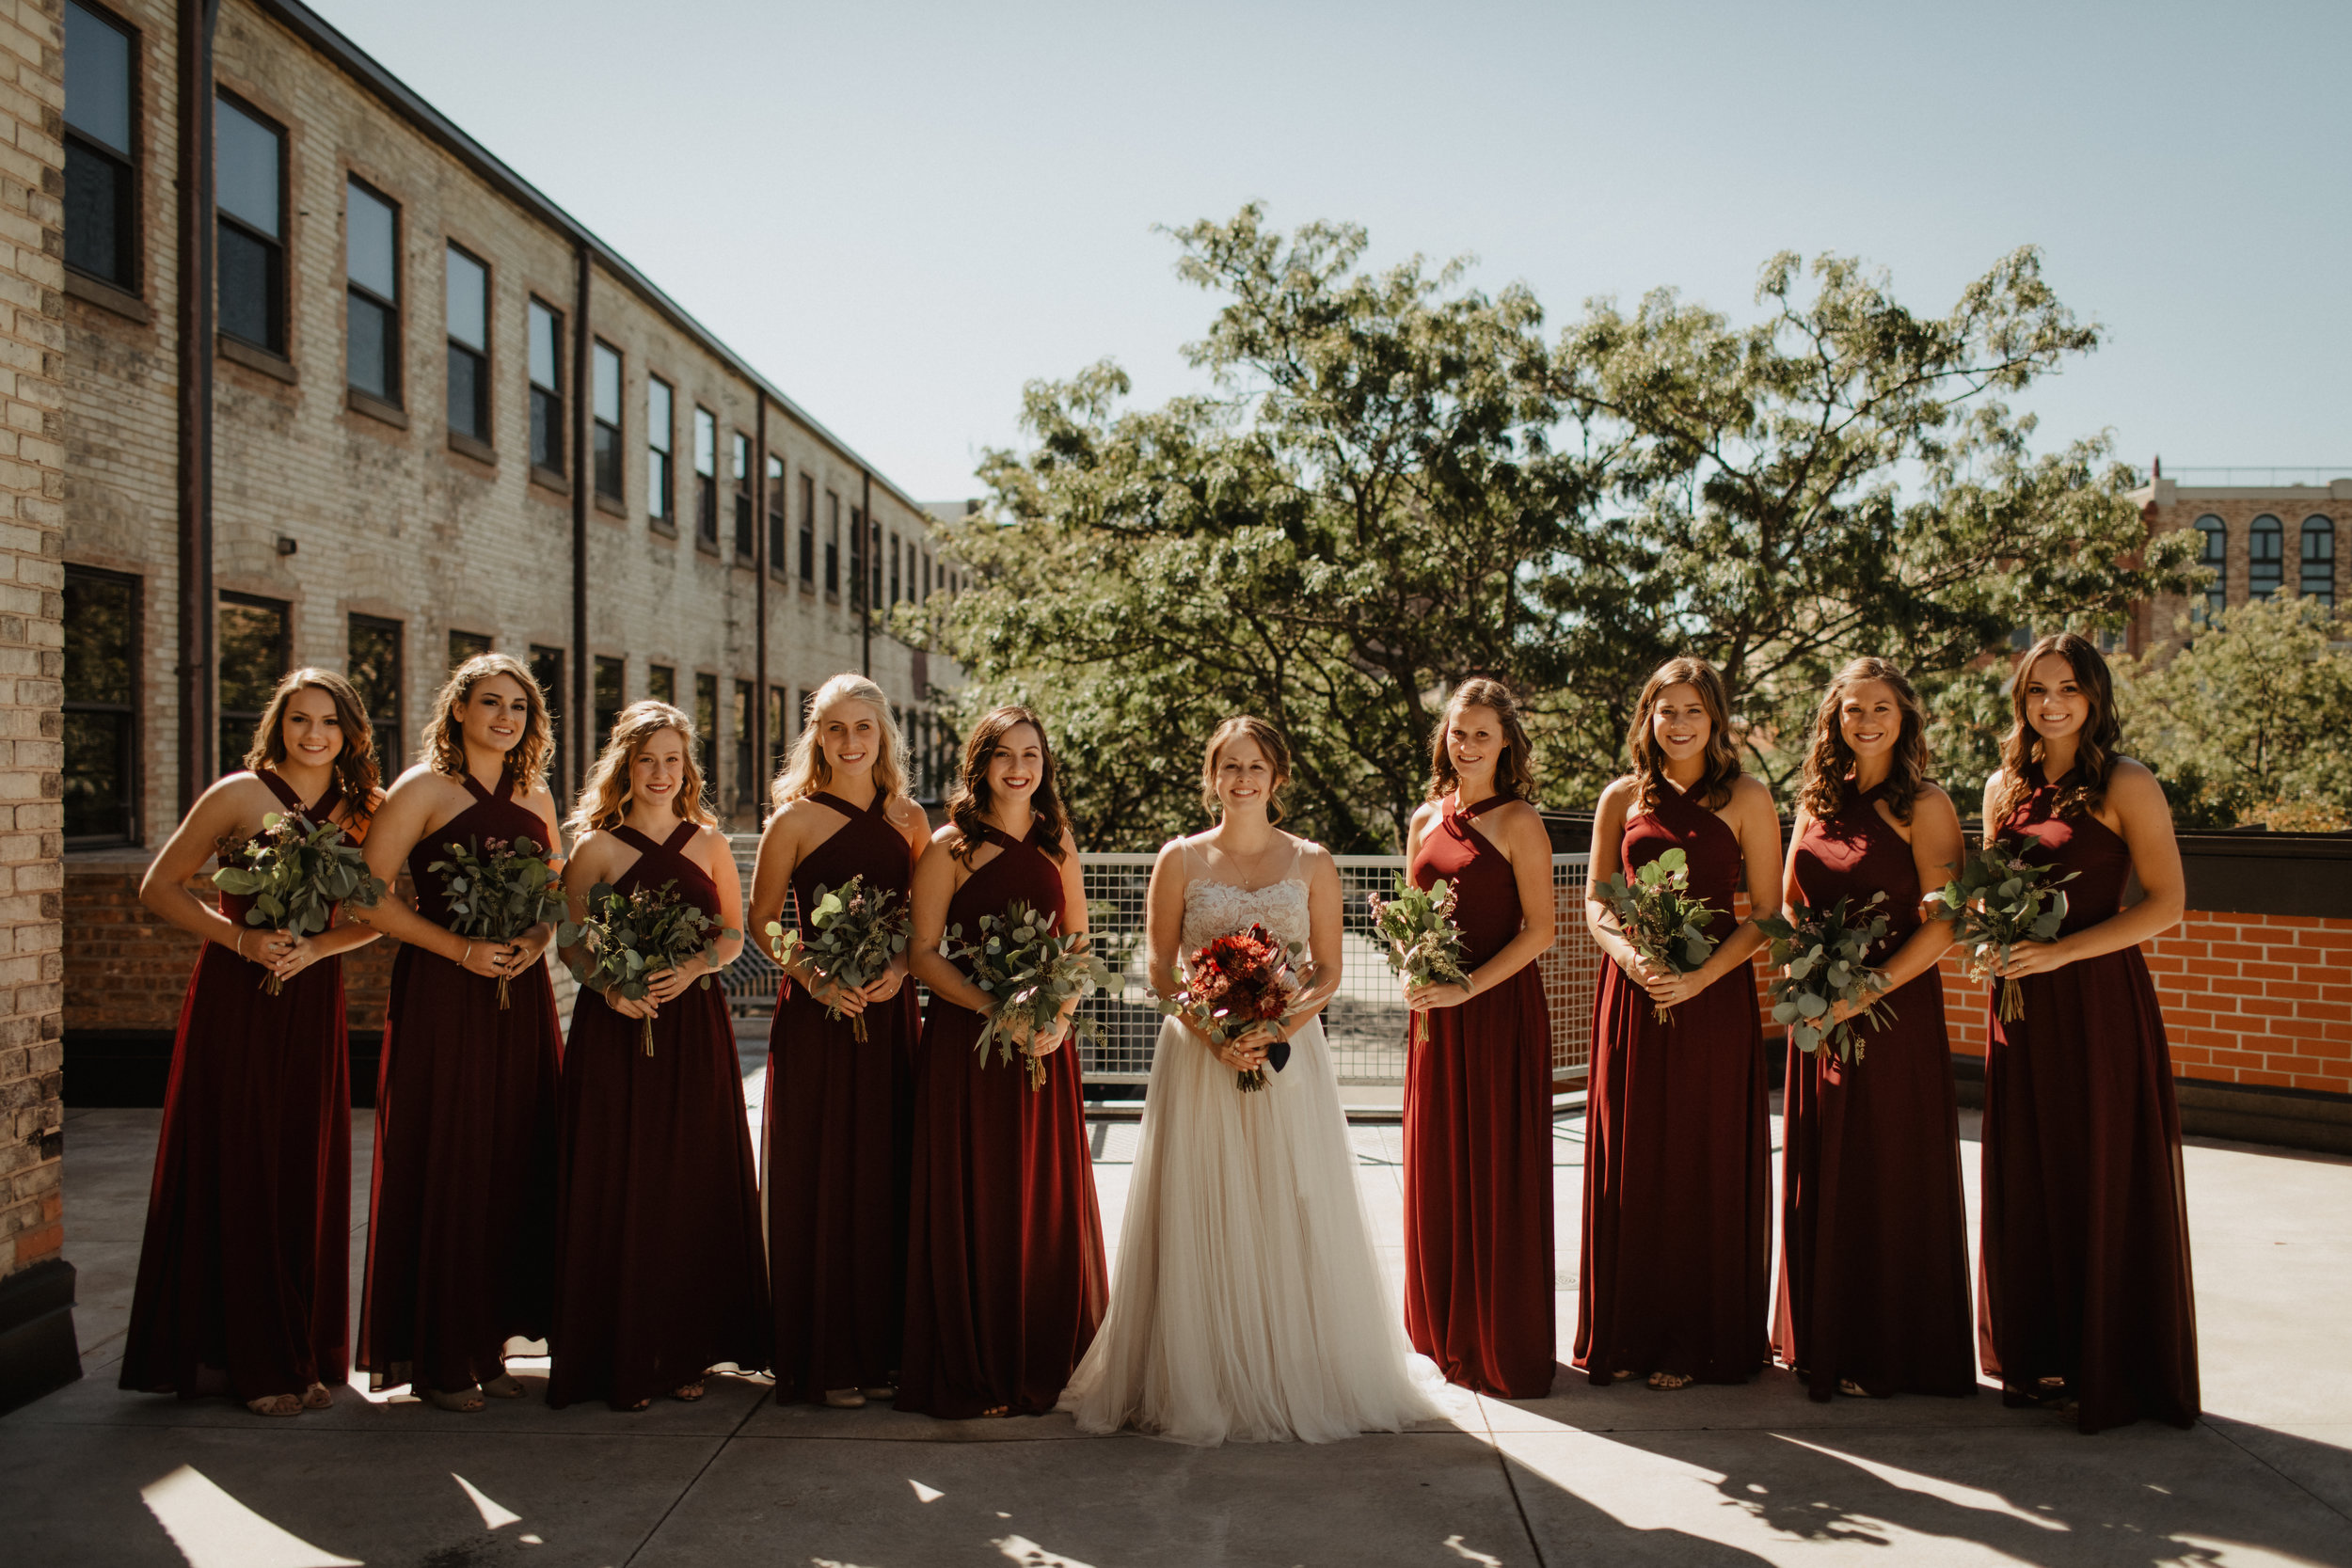 Cit-Bridesmaids-Photographer-01